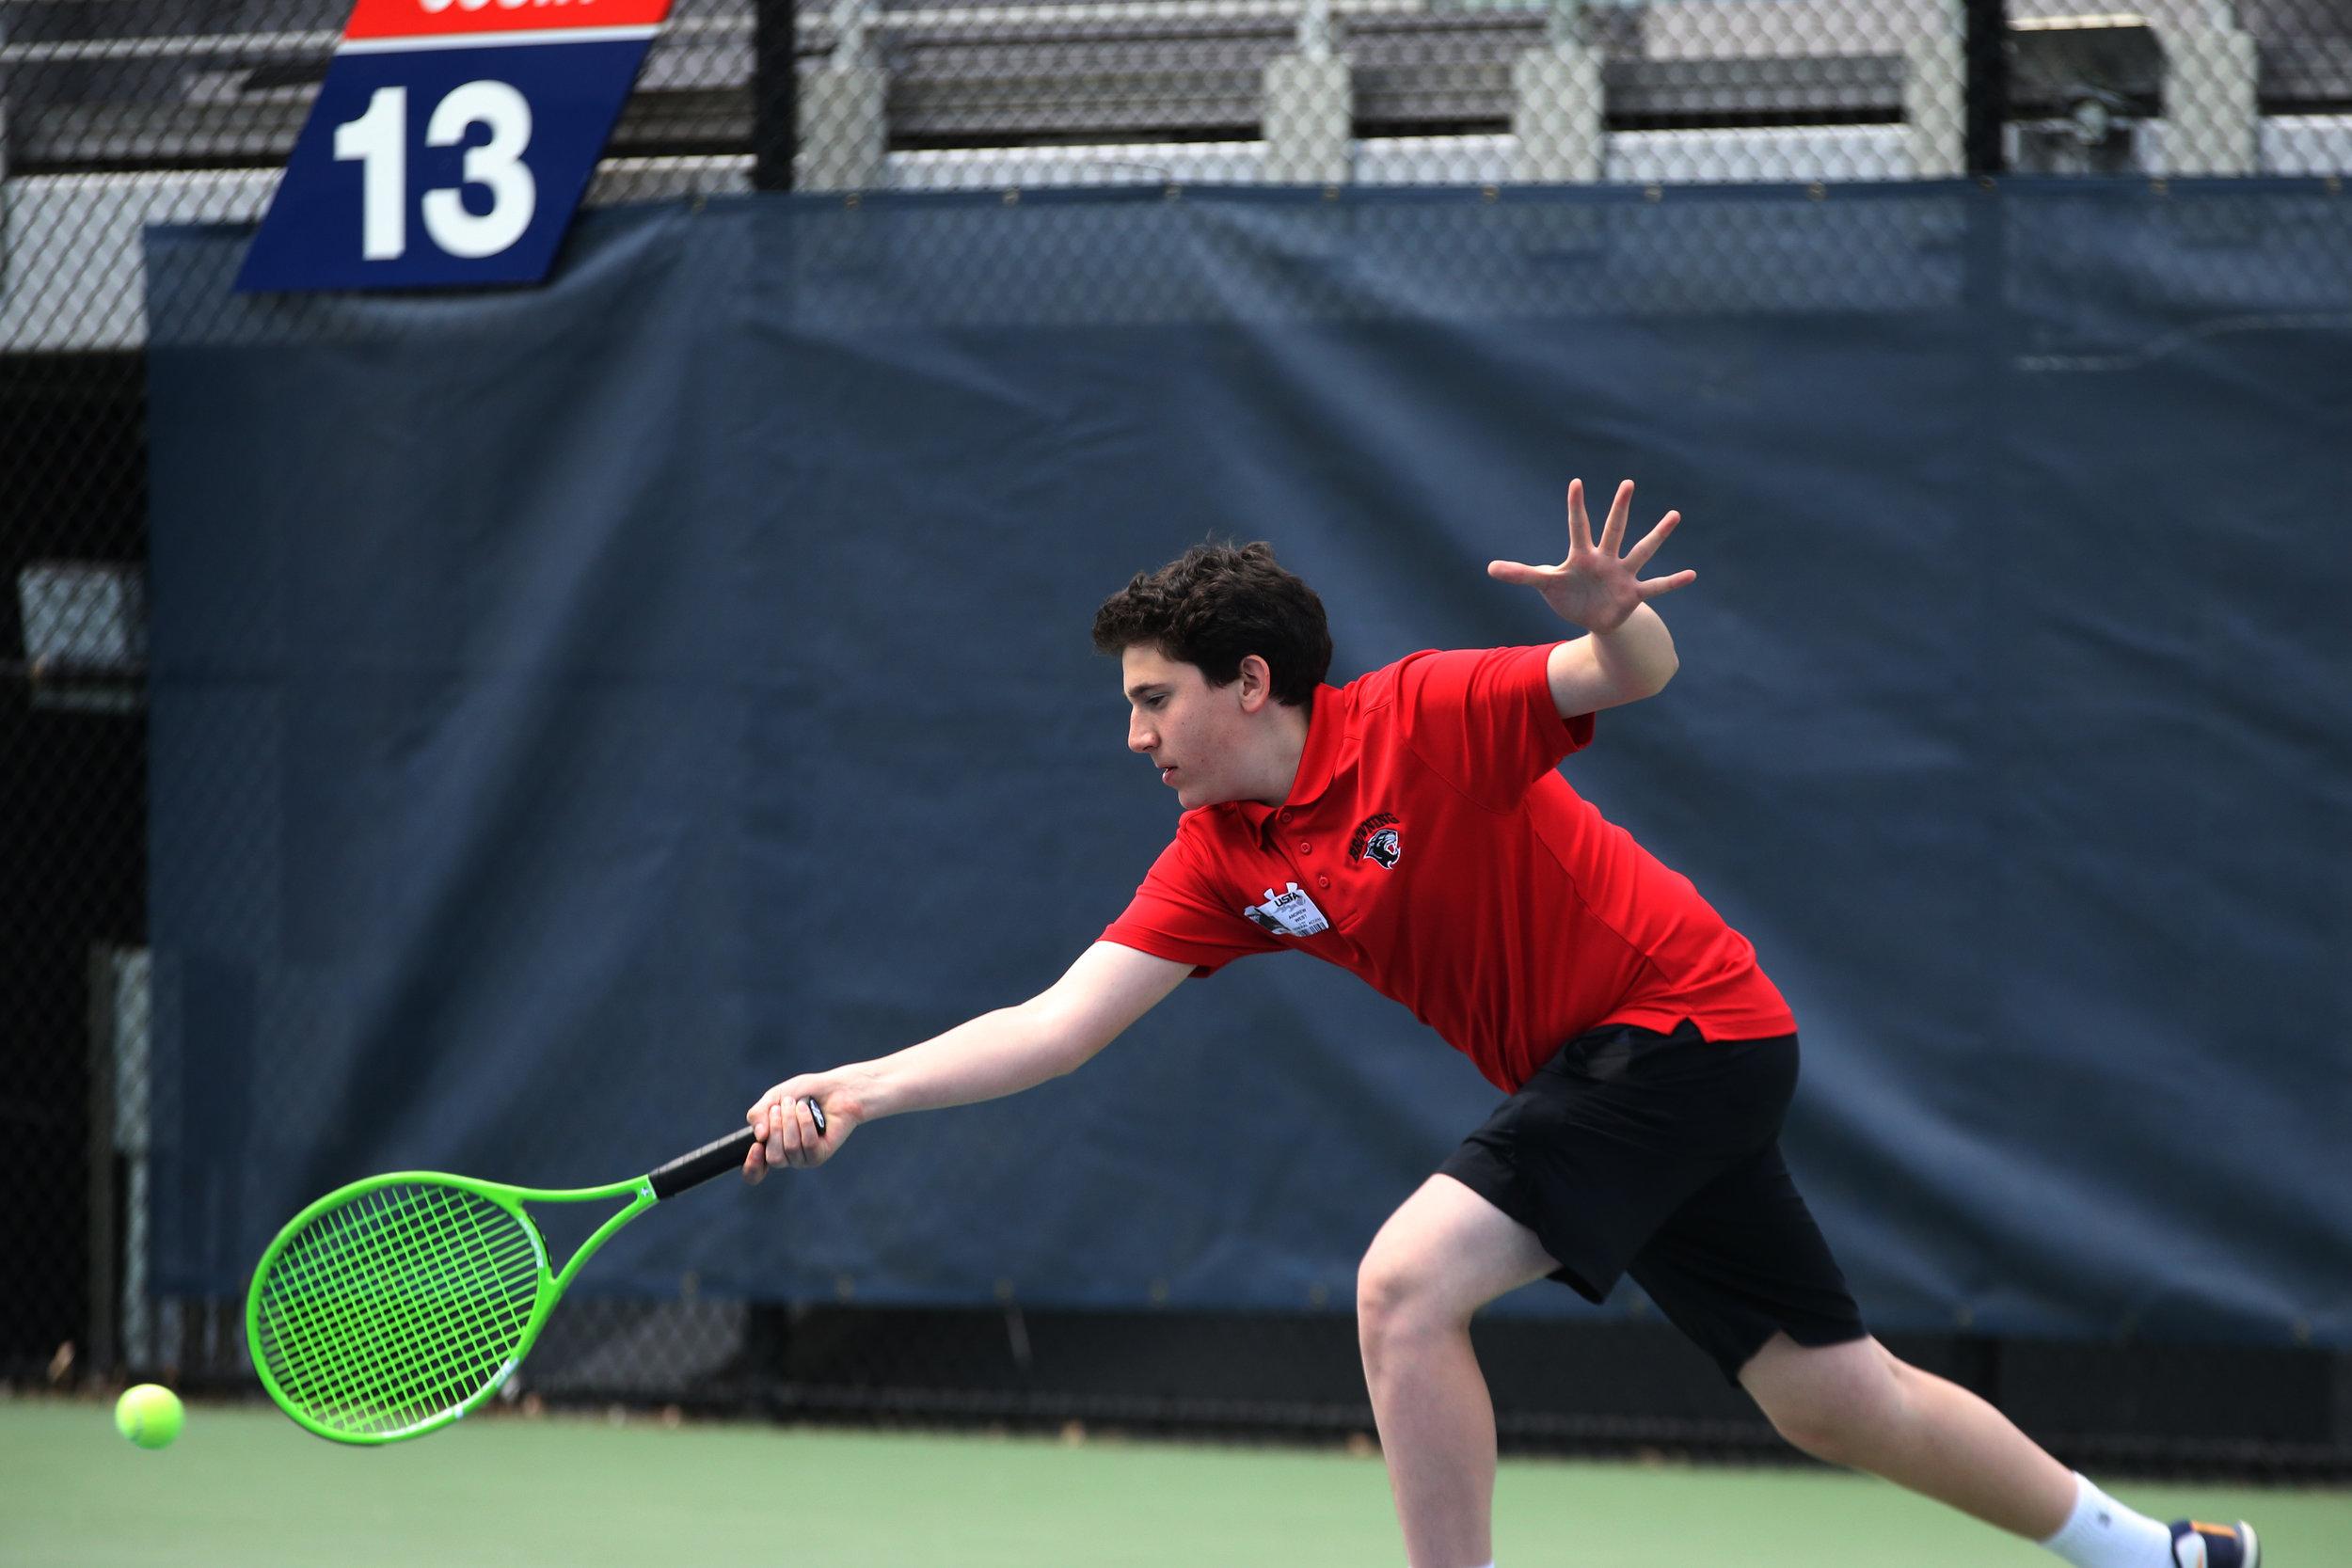 NYCAL Tennis Championships 051519-Al Pereira (1000).JPG